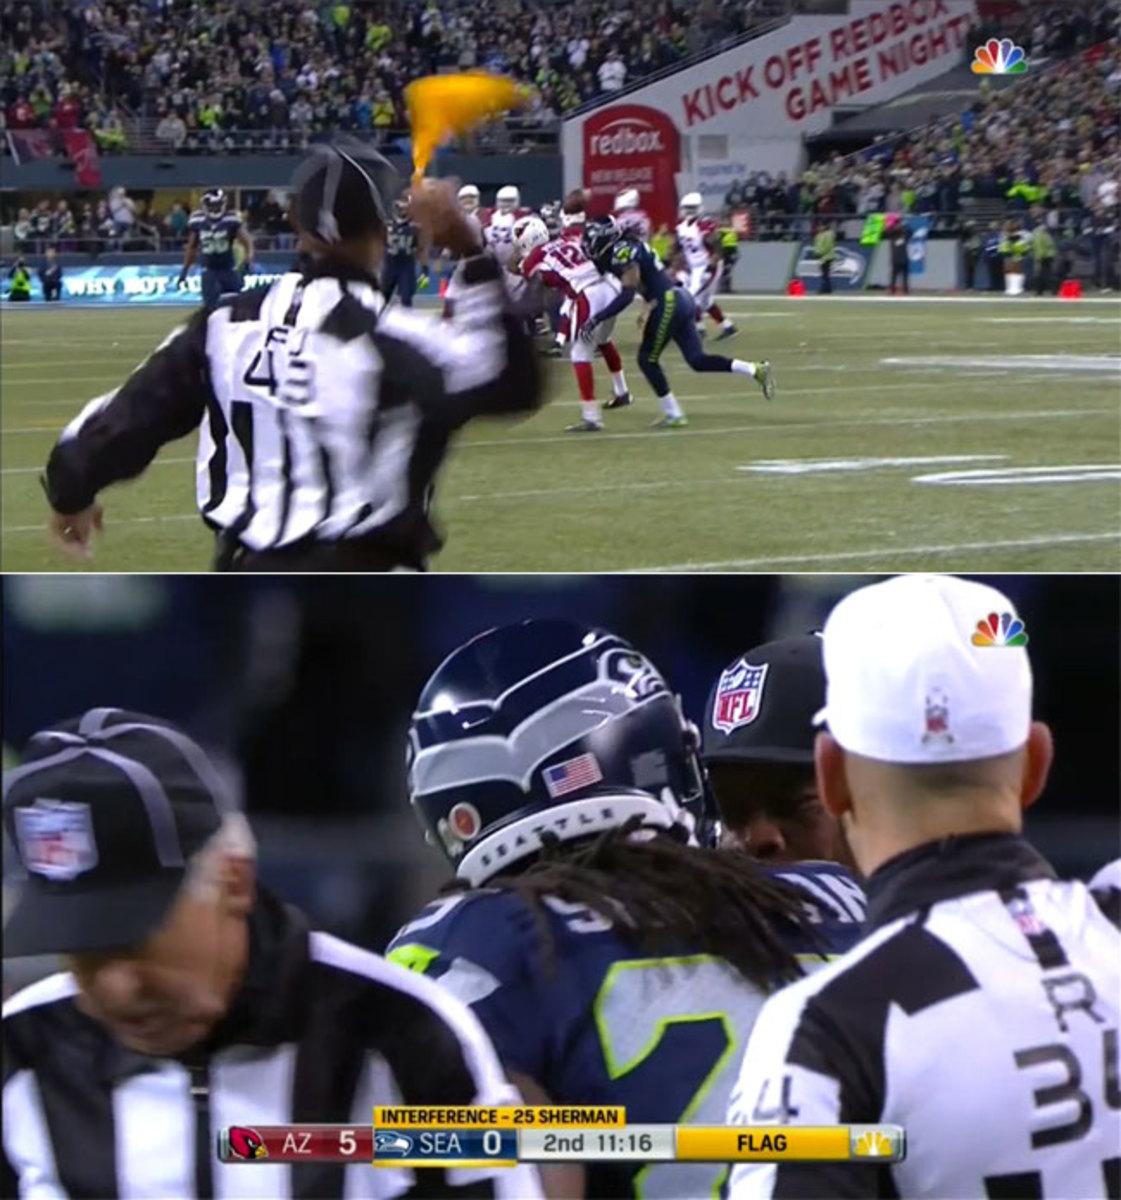 richard-sherman-flagged-for-penalty.jpg